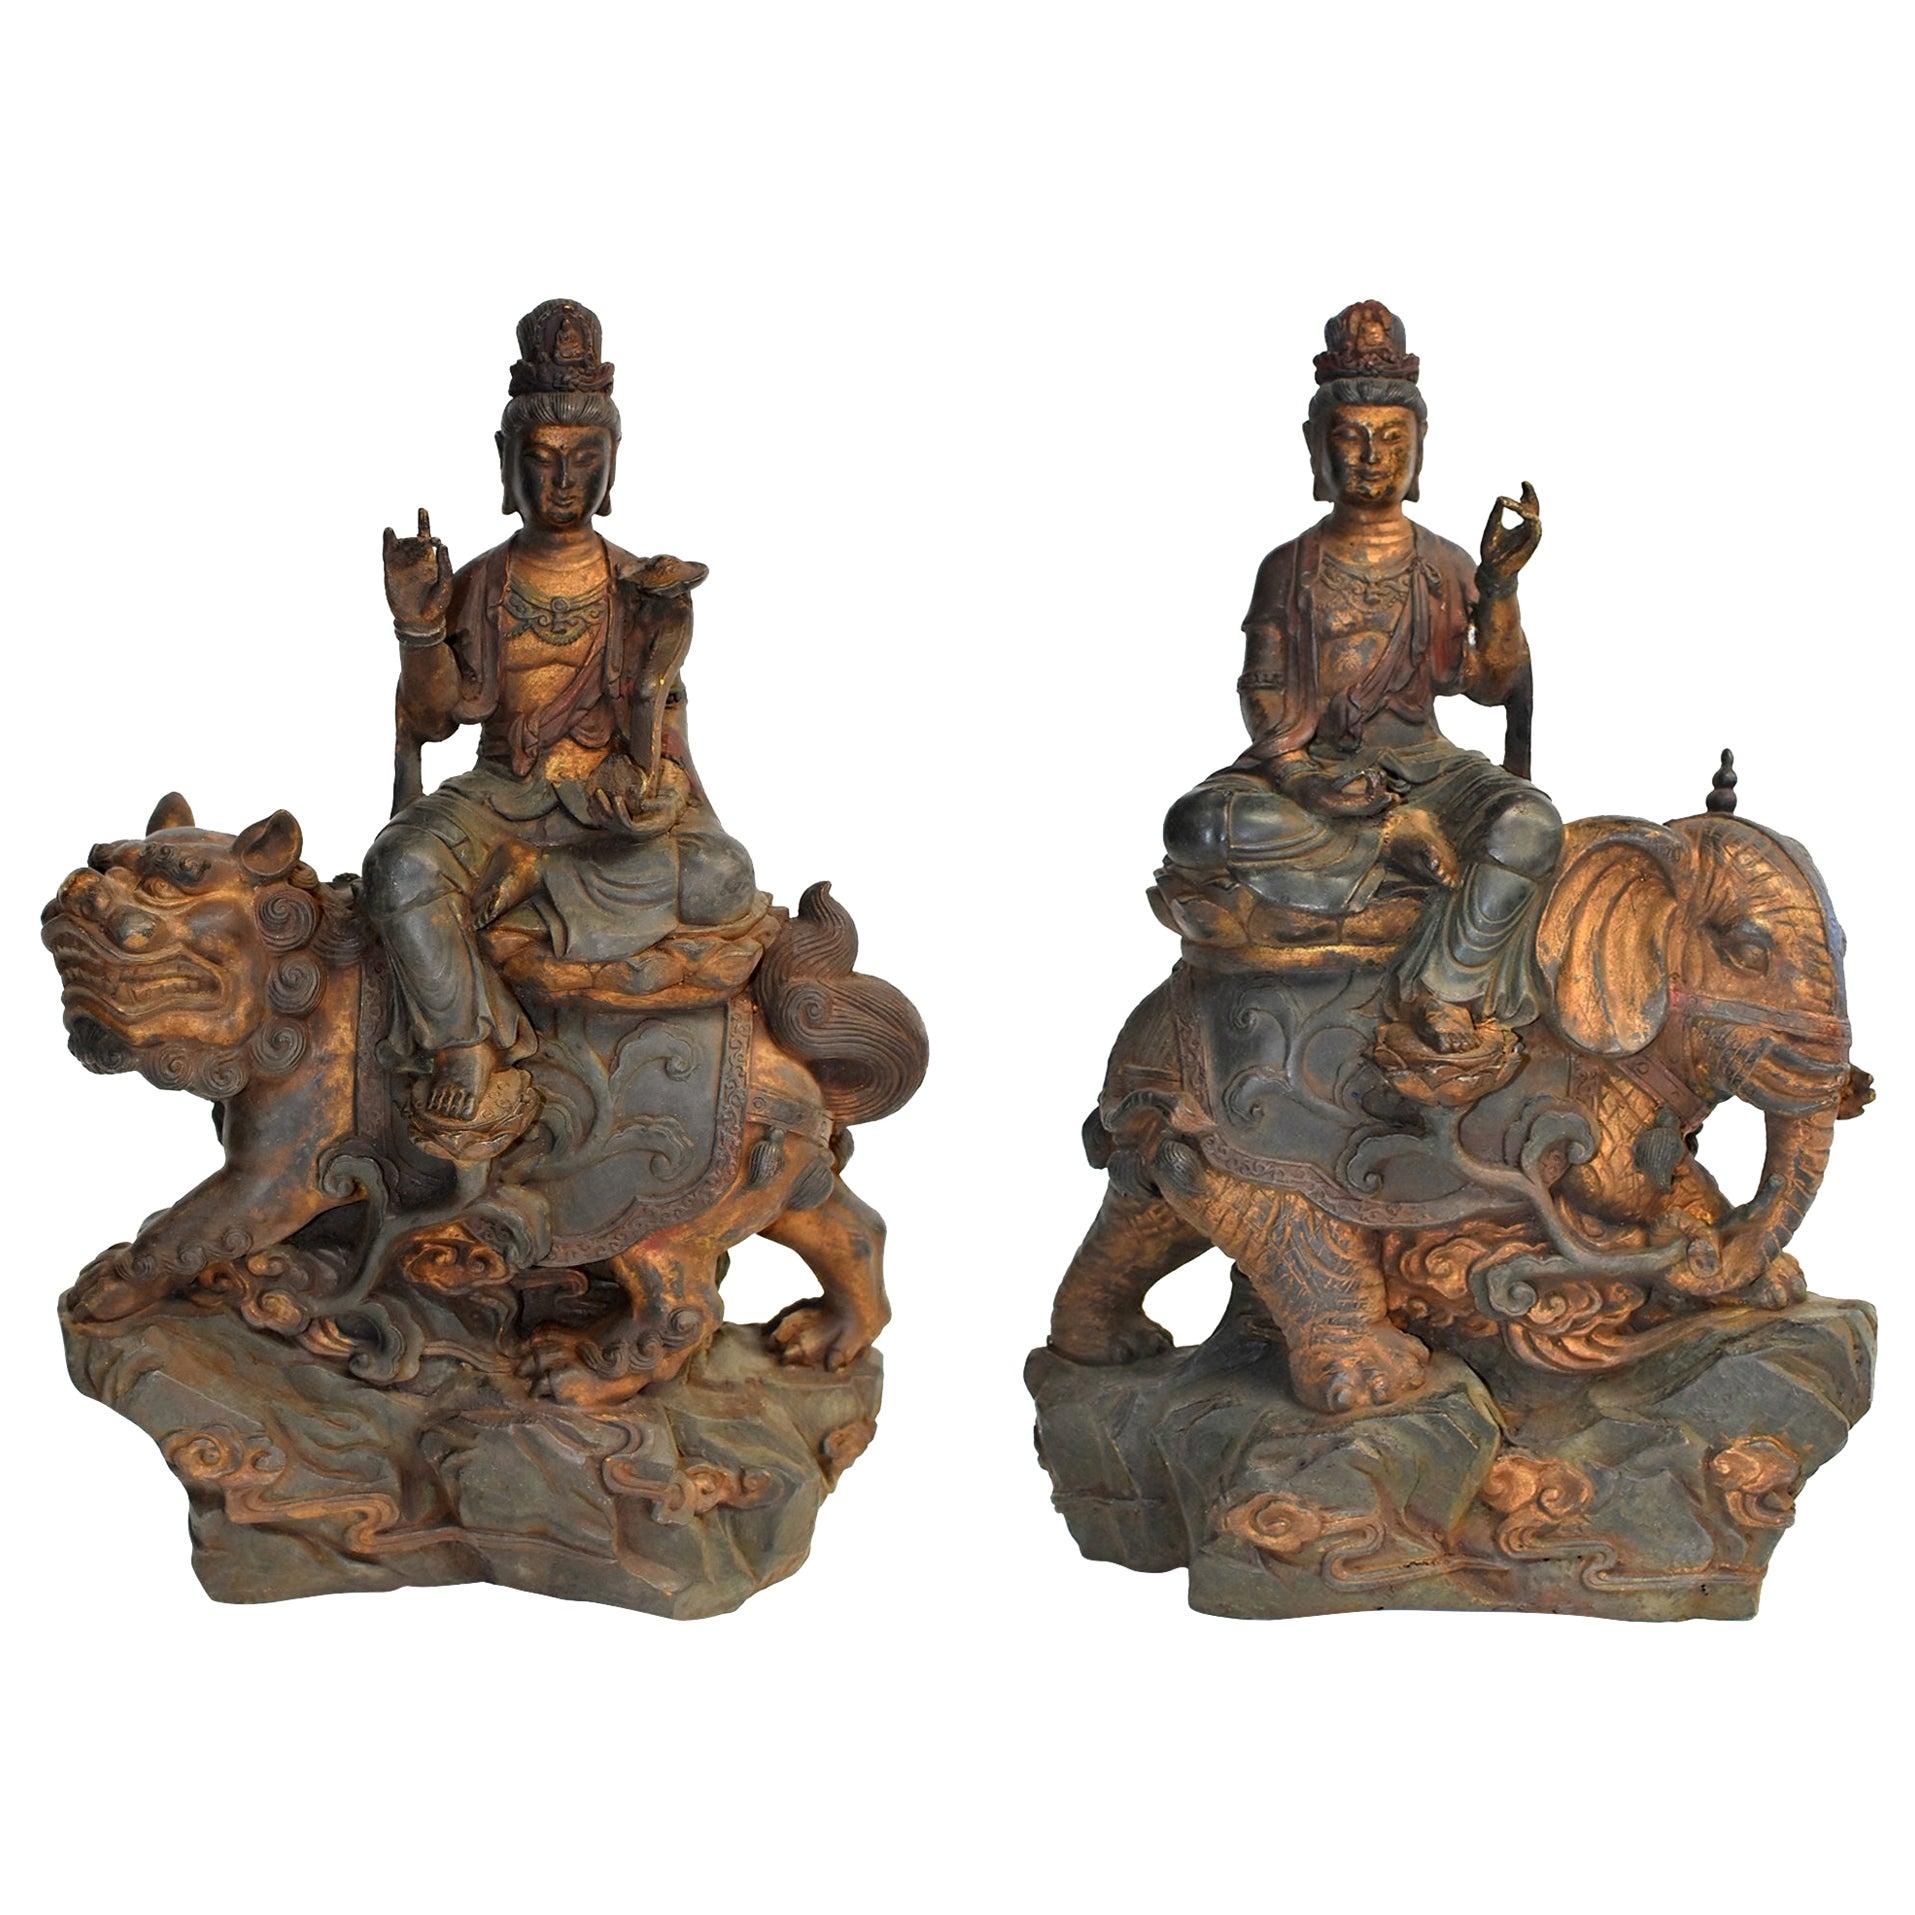 Pair of Antique Polychrome Bronze Avalokiteshvara Buddha Statues